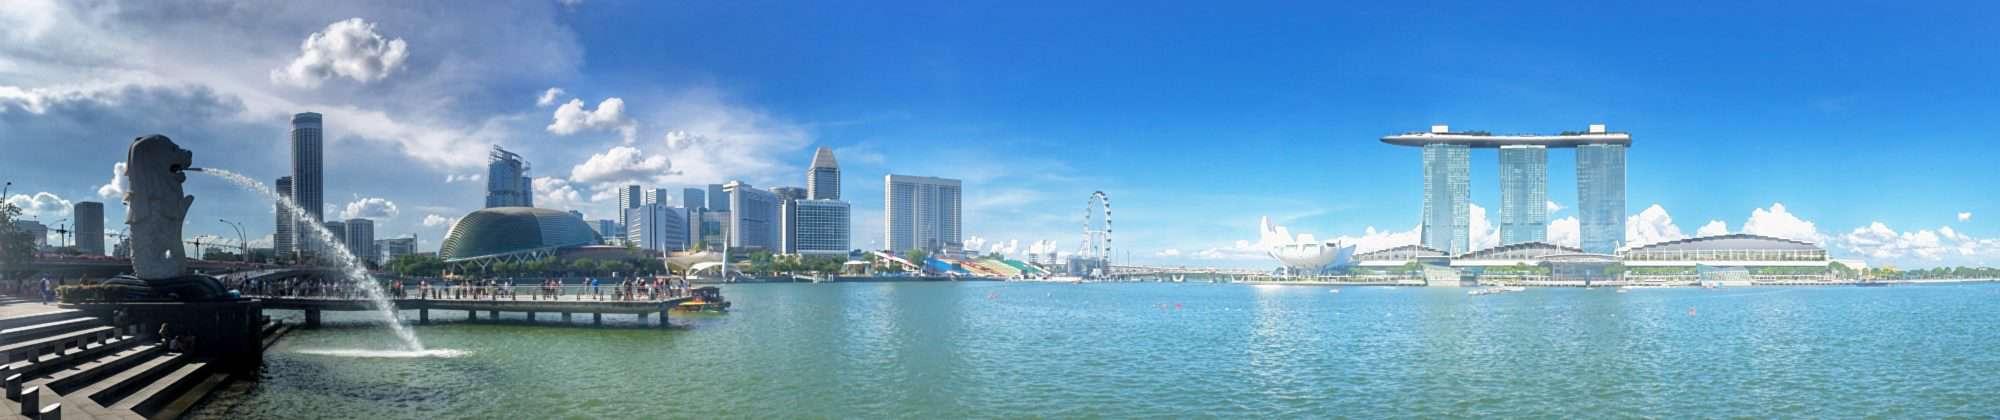 Foto-Highlights in Singapur: Skyline